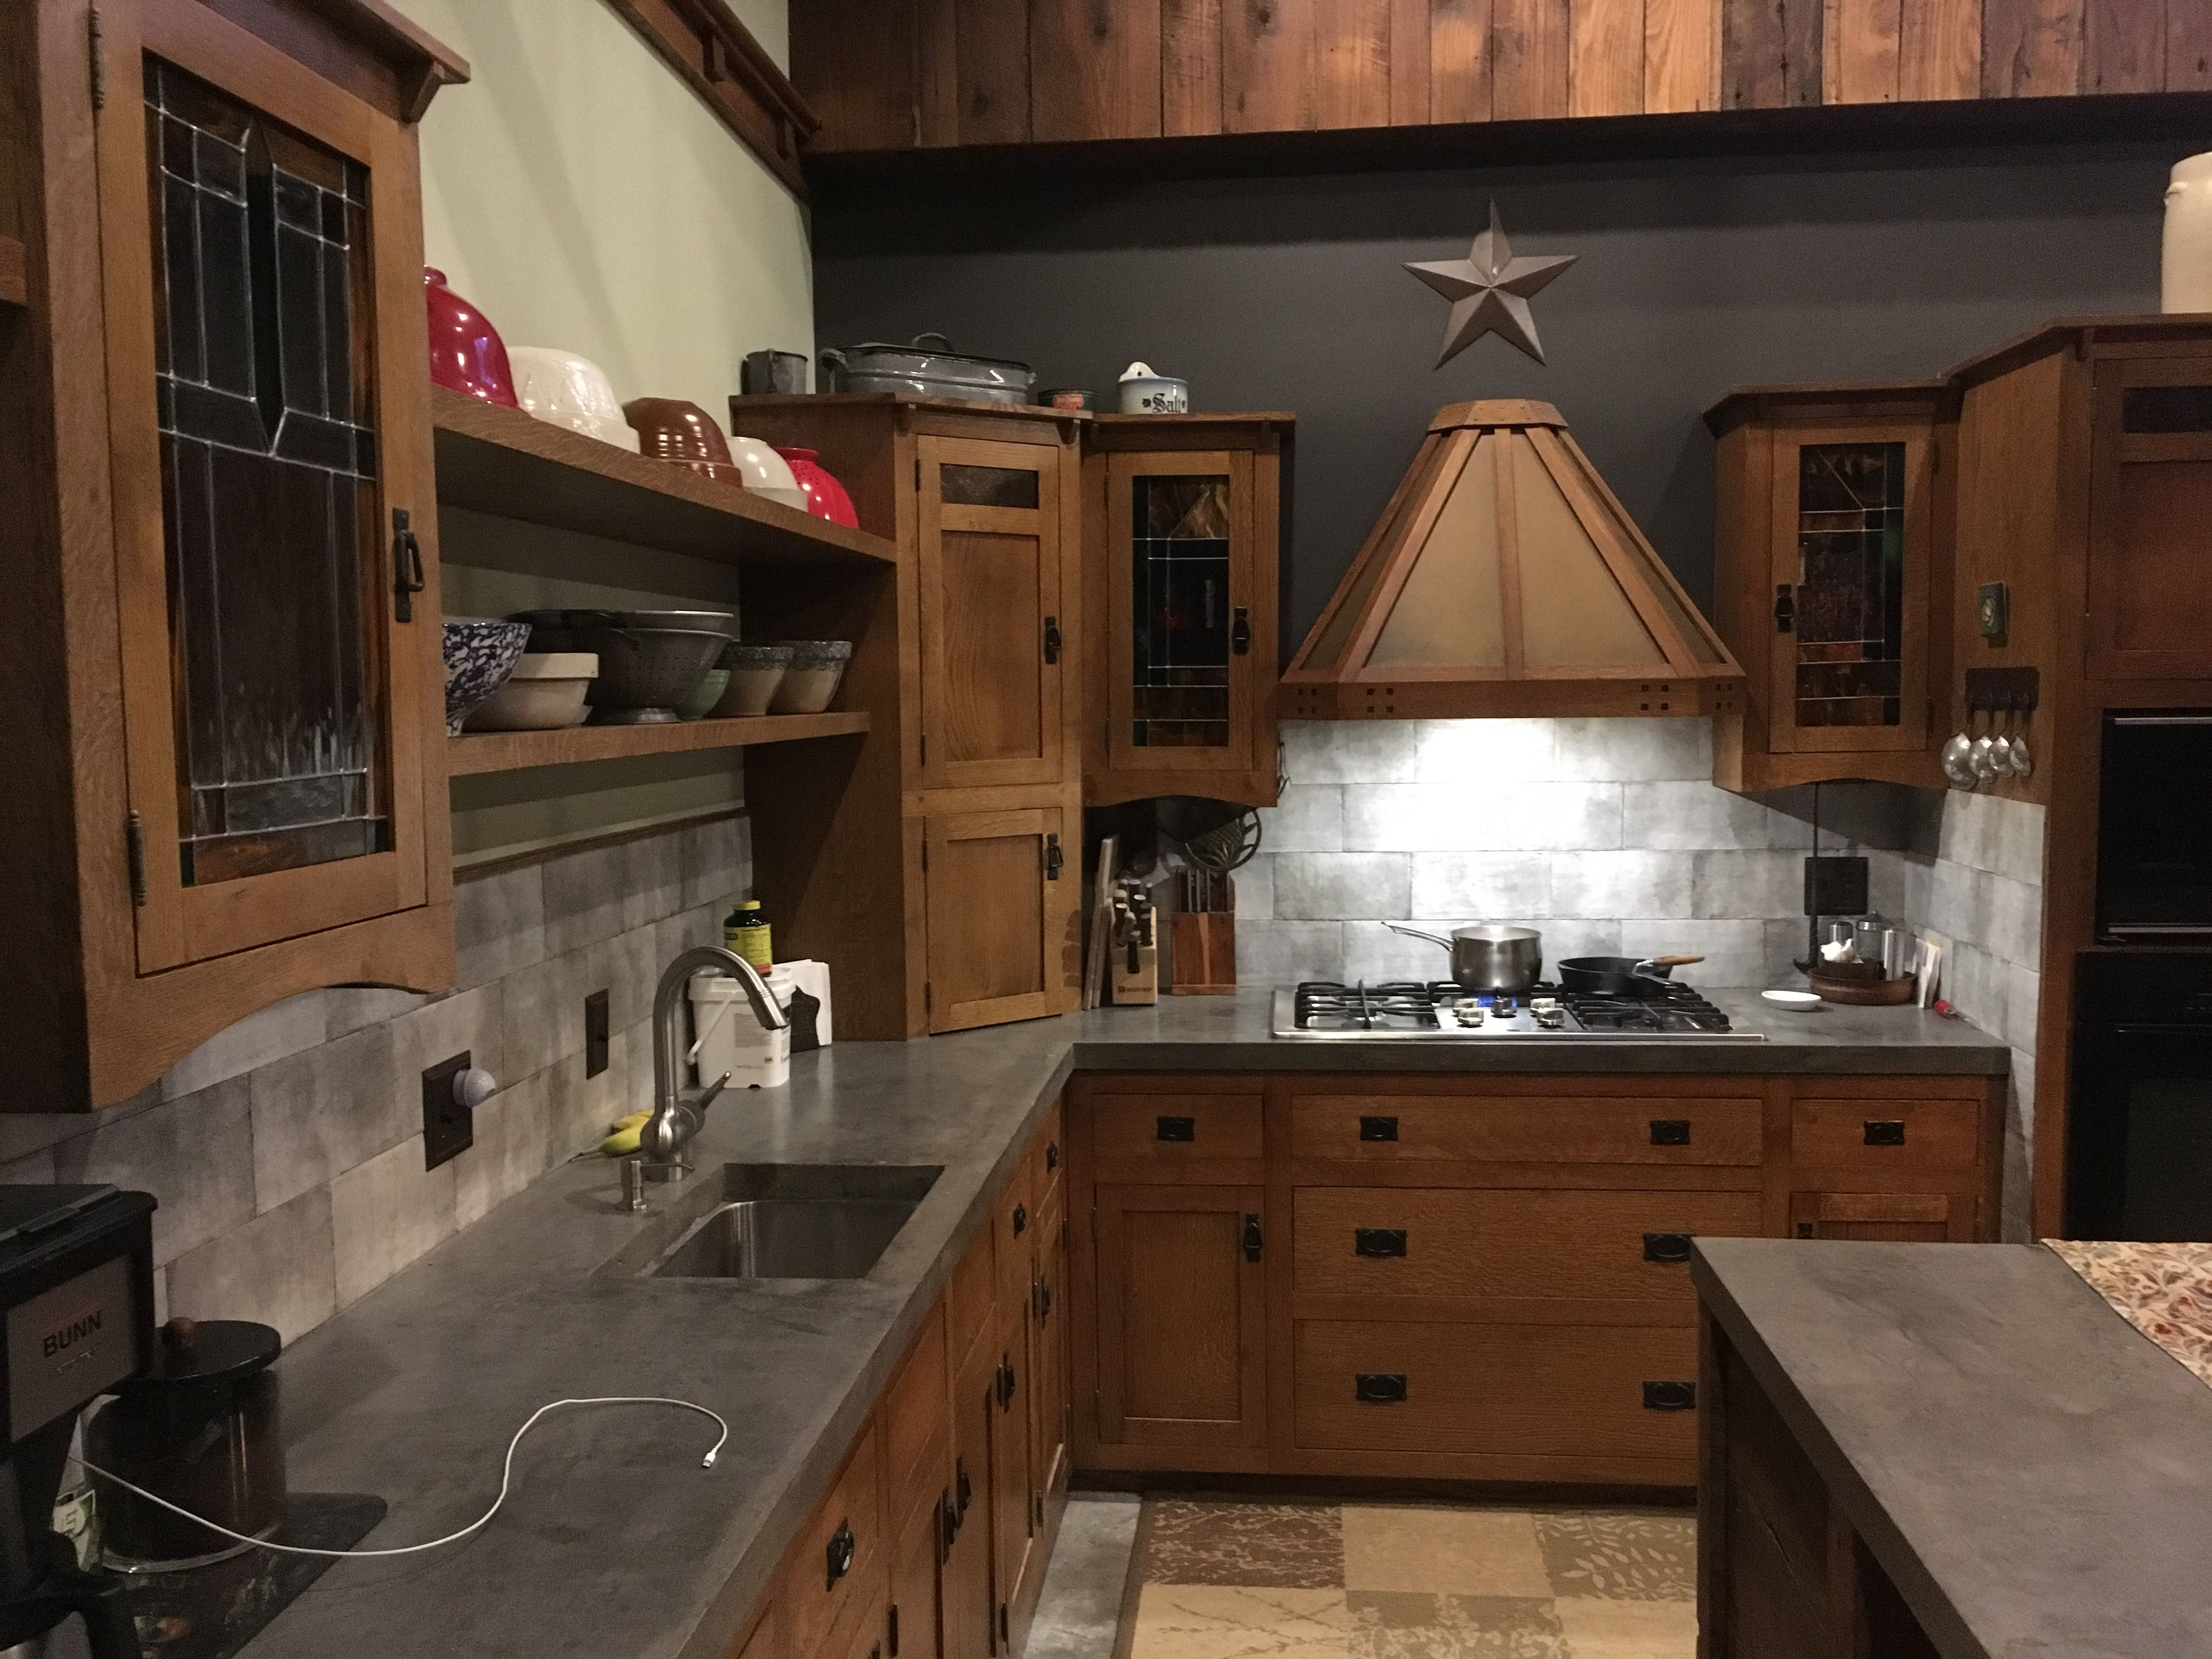 Quartersawn Oak Cabinets With Concrete Countertops Craftsman Style Kitchens Interior Design Kitchen Kitchen Design